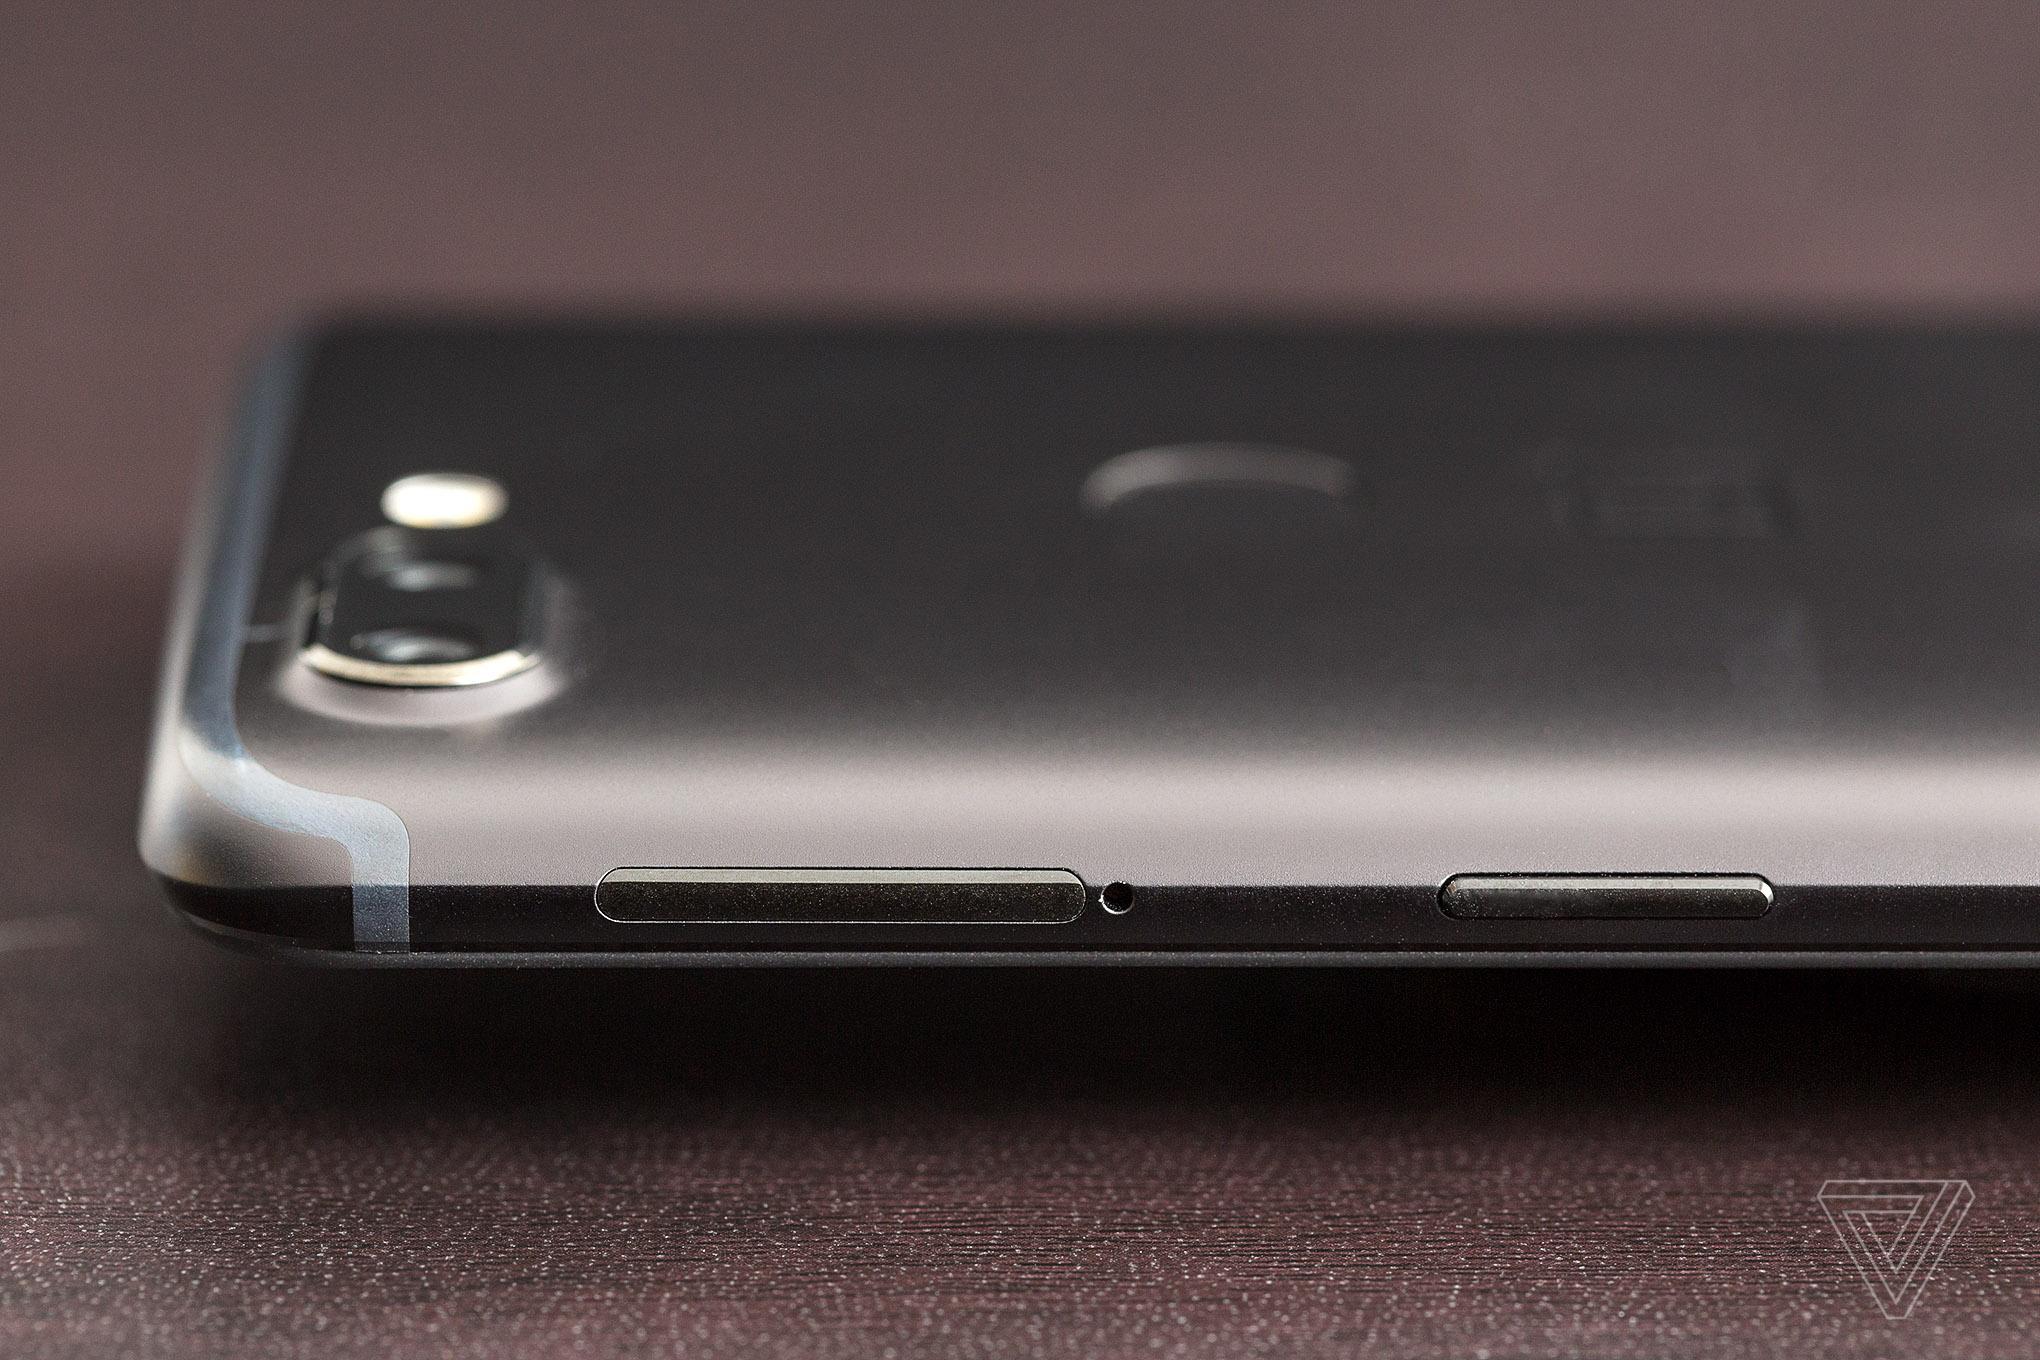 One Plus phone